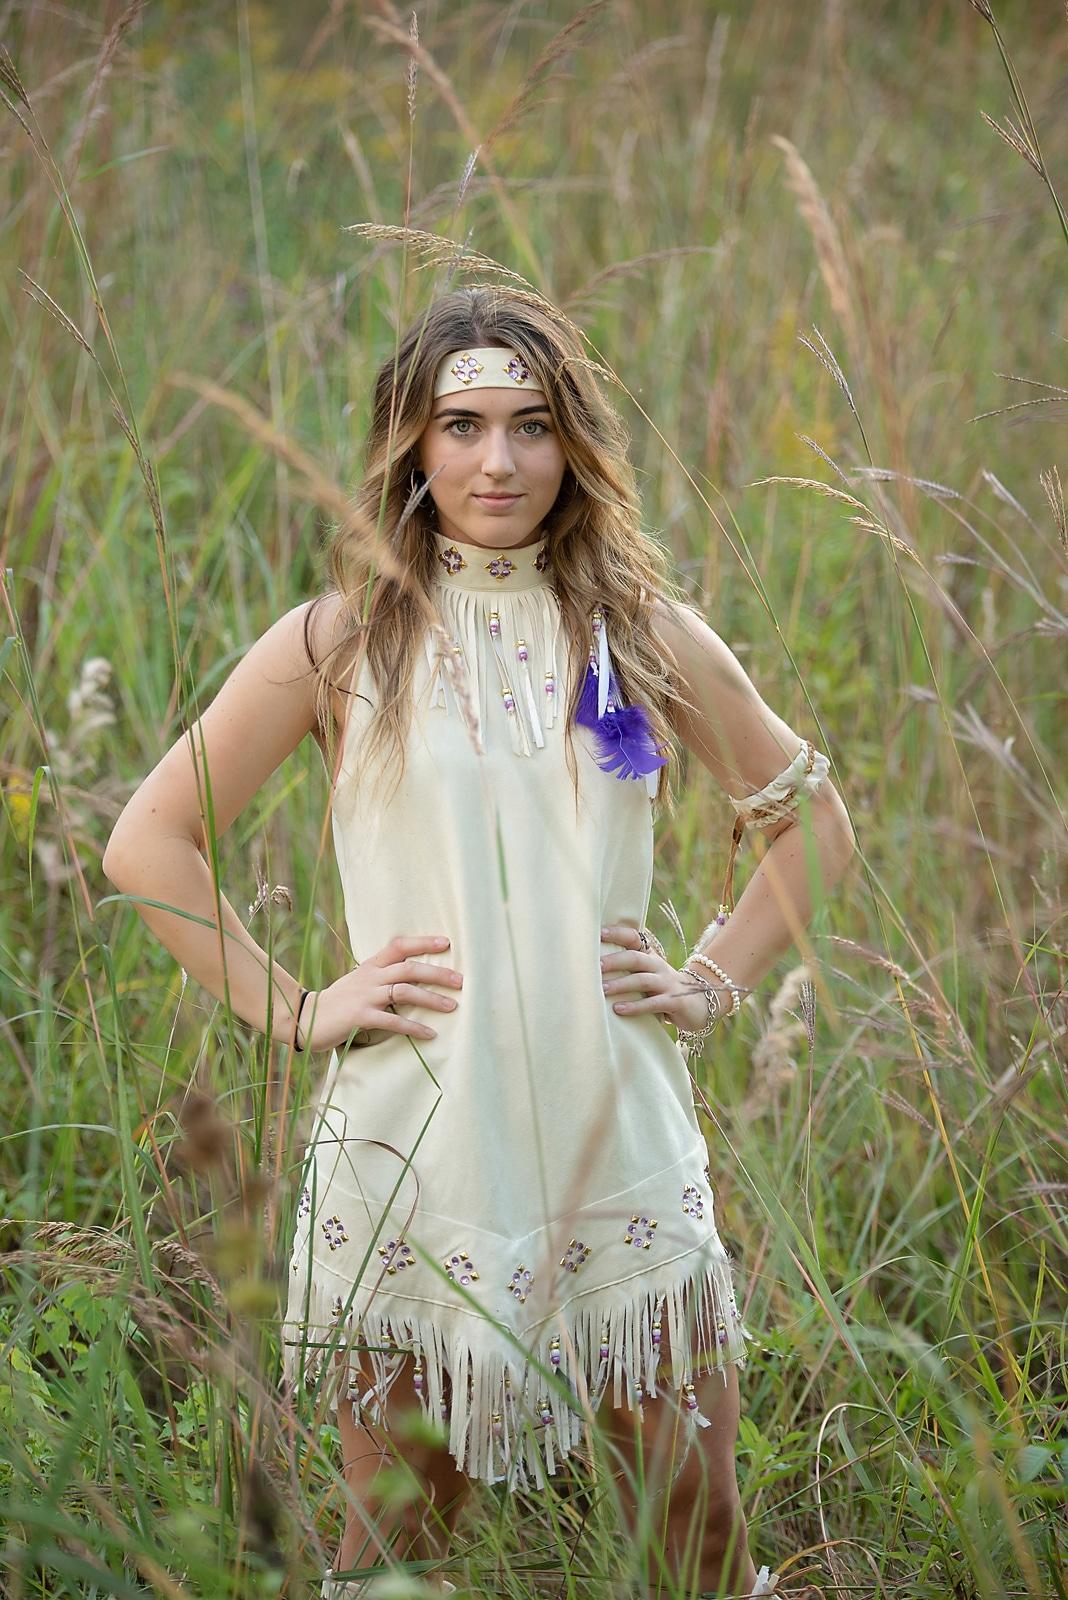 Senior Photo In Prairie Grass